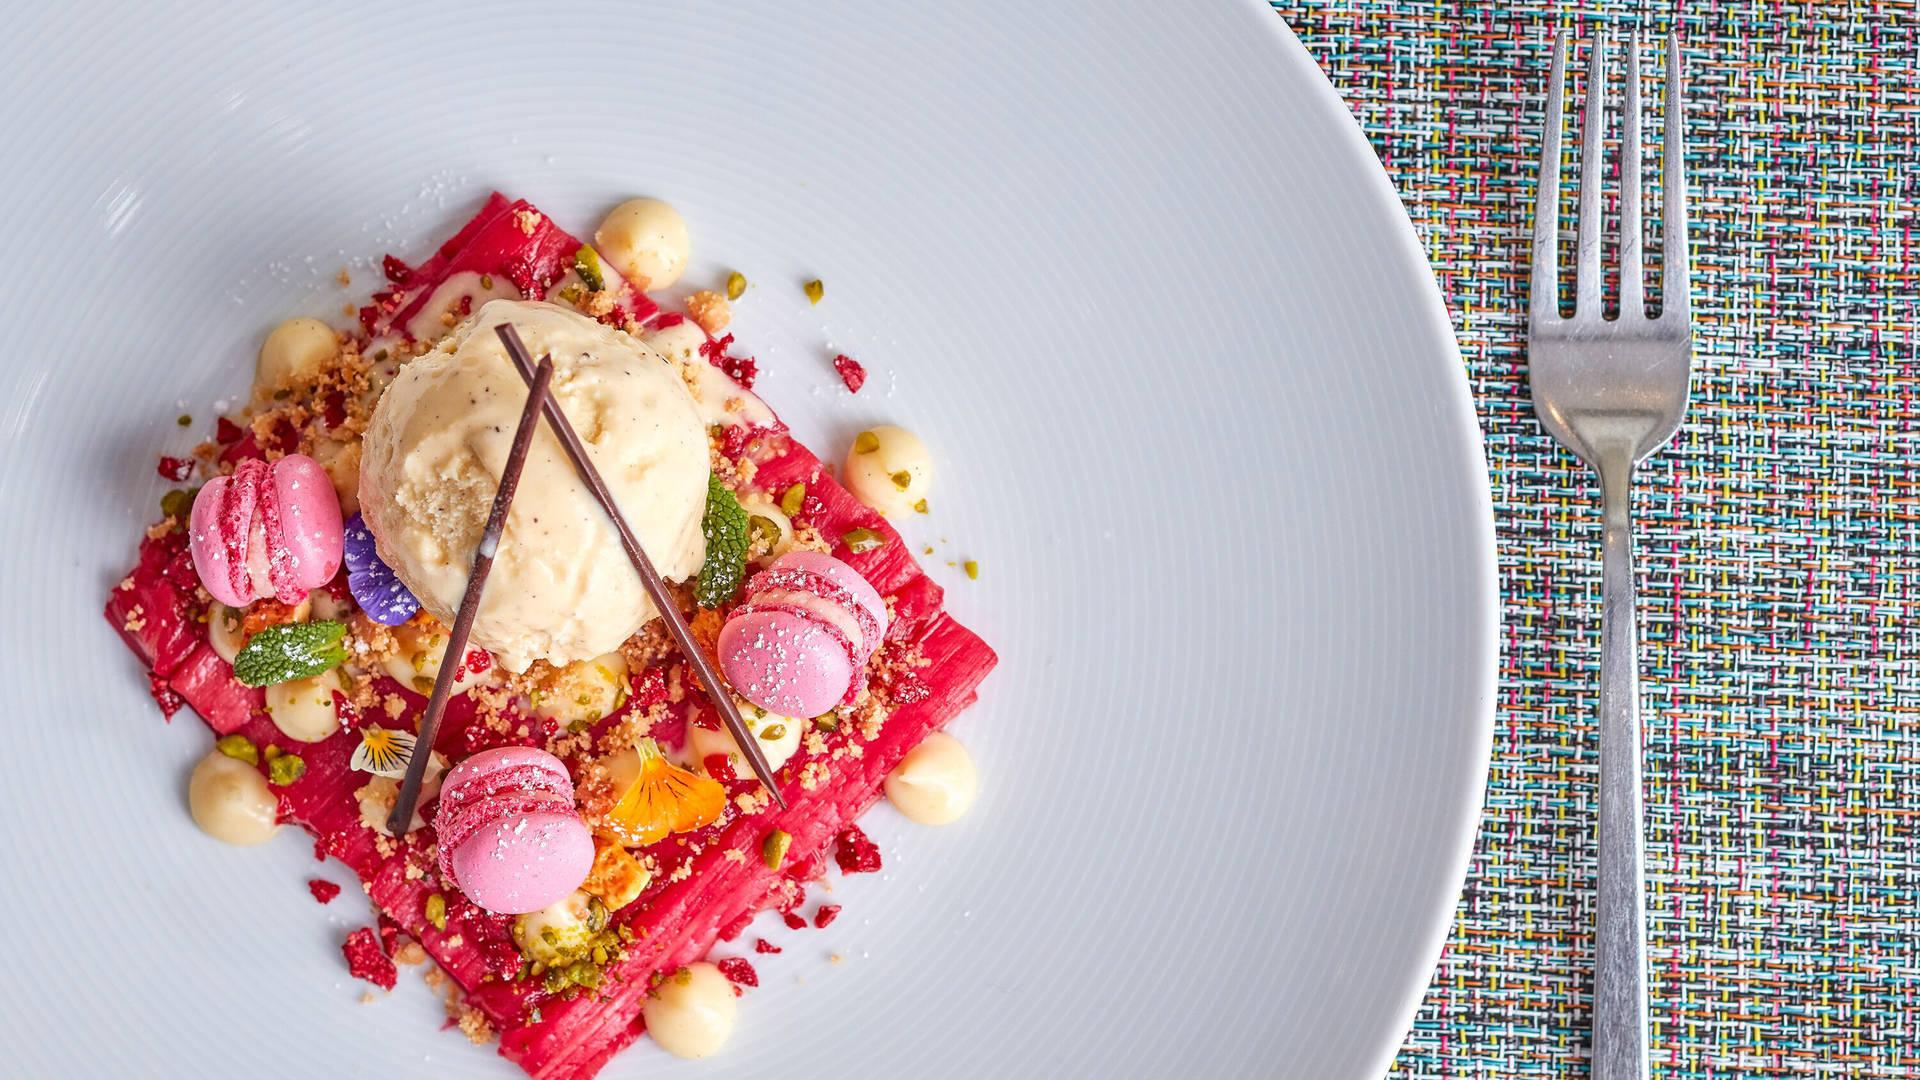 https://cdn.jumeirah.com/-/mediadh/DH/Hospitality/Jumeirah/Restaurants/London/Lowndes-Bar-and-Kitchen/Restaurant-Gallery/Jumeirah-Lowndes-Hotel-Lowndes-Bar-Kitchen-Dessert-16-9.jpg?h=1080&w=1920&hash=F0A1491DA14A79B9C0B78F64D49870F9